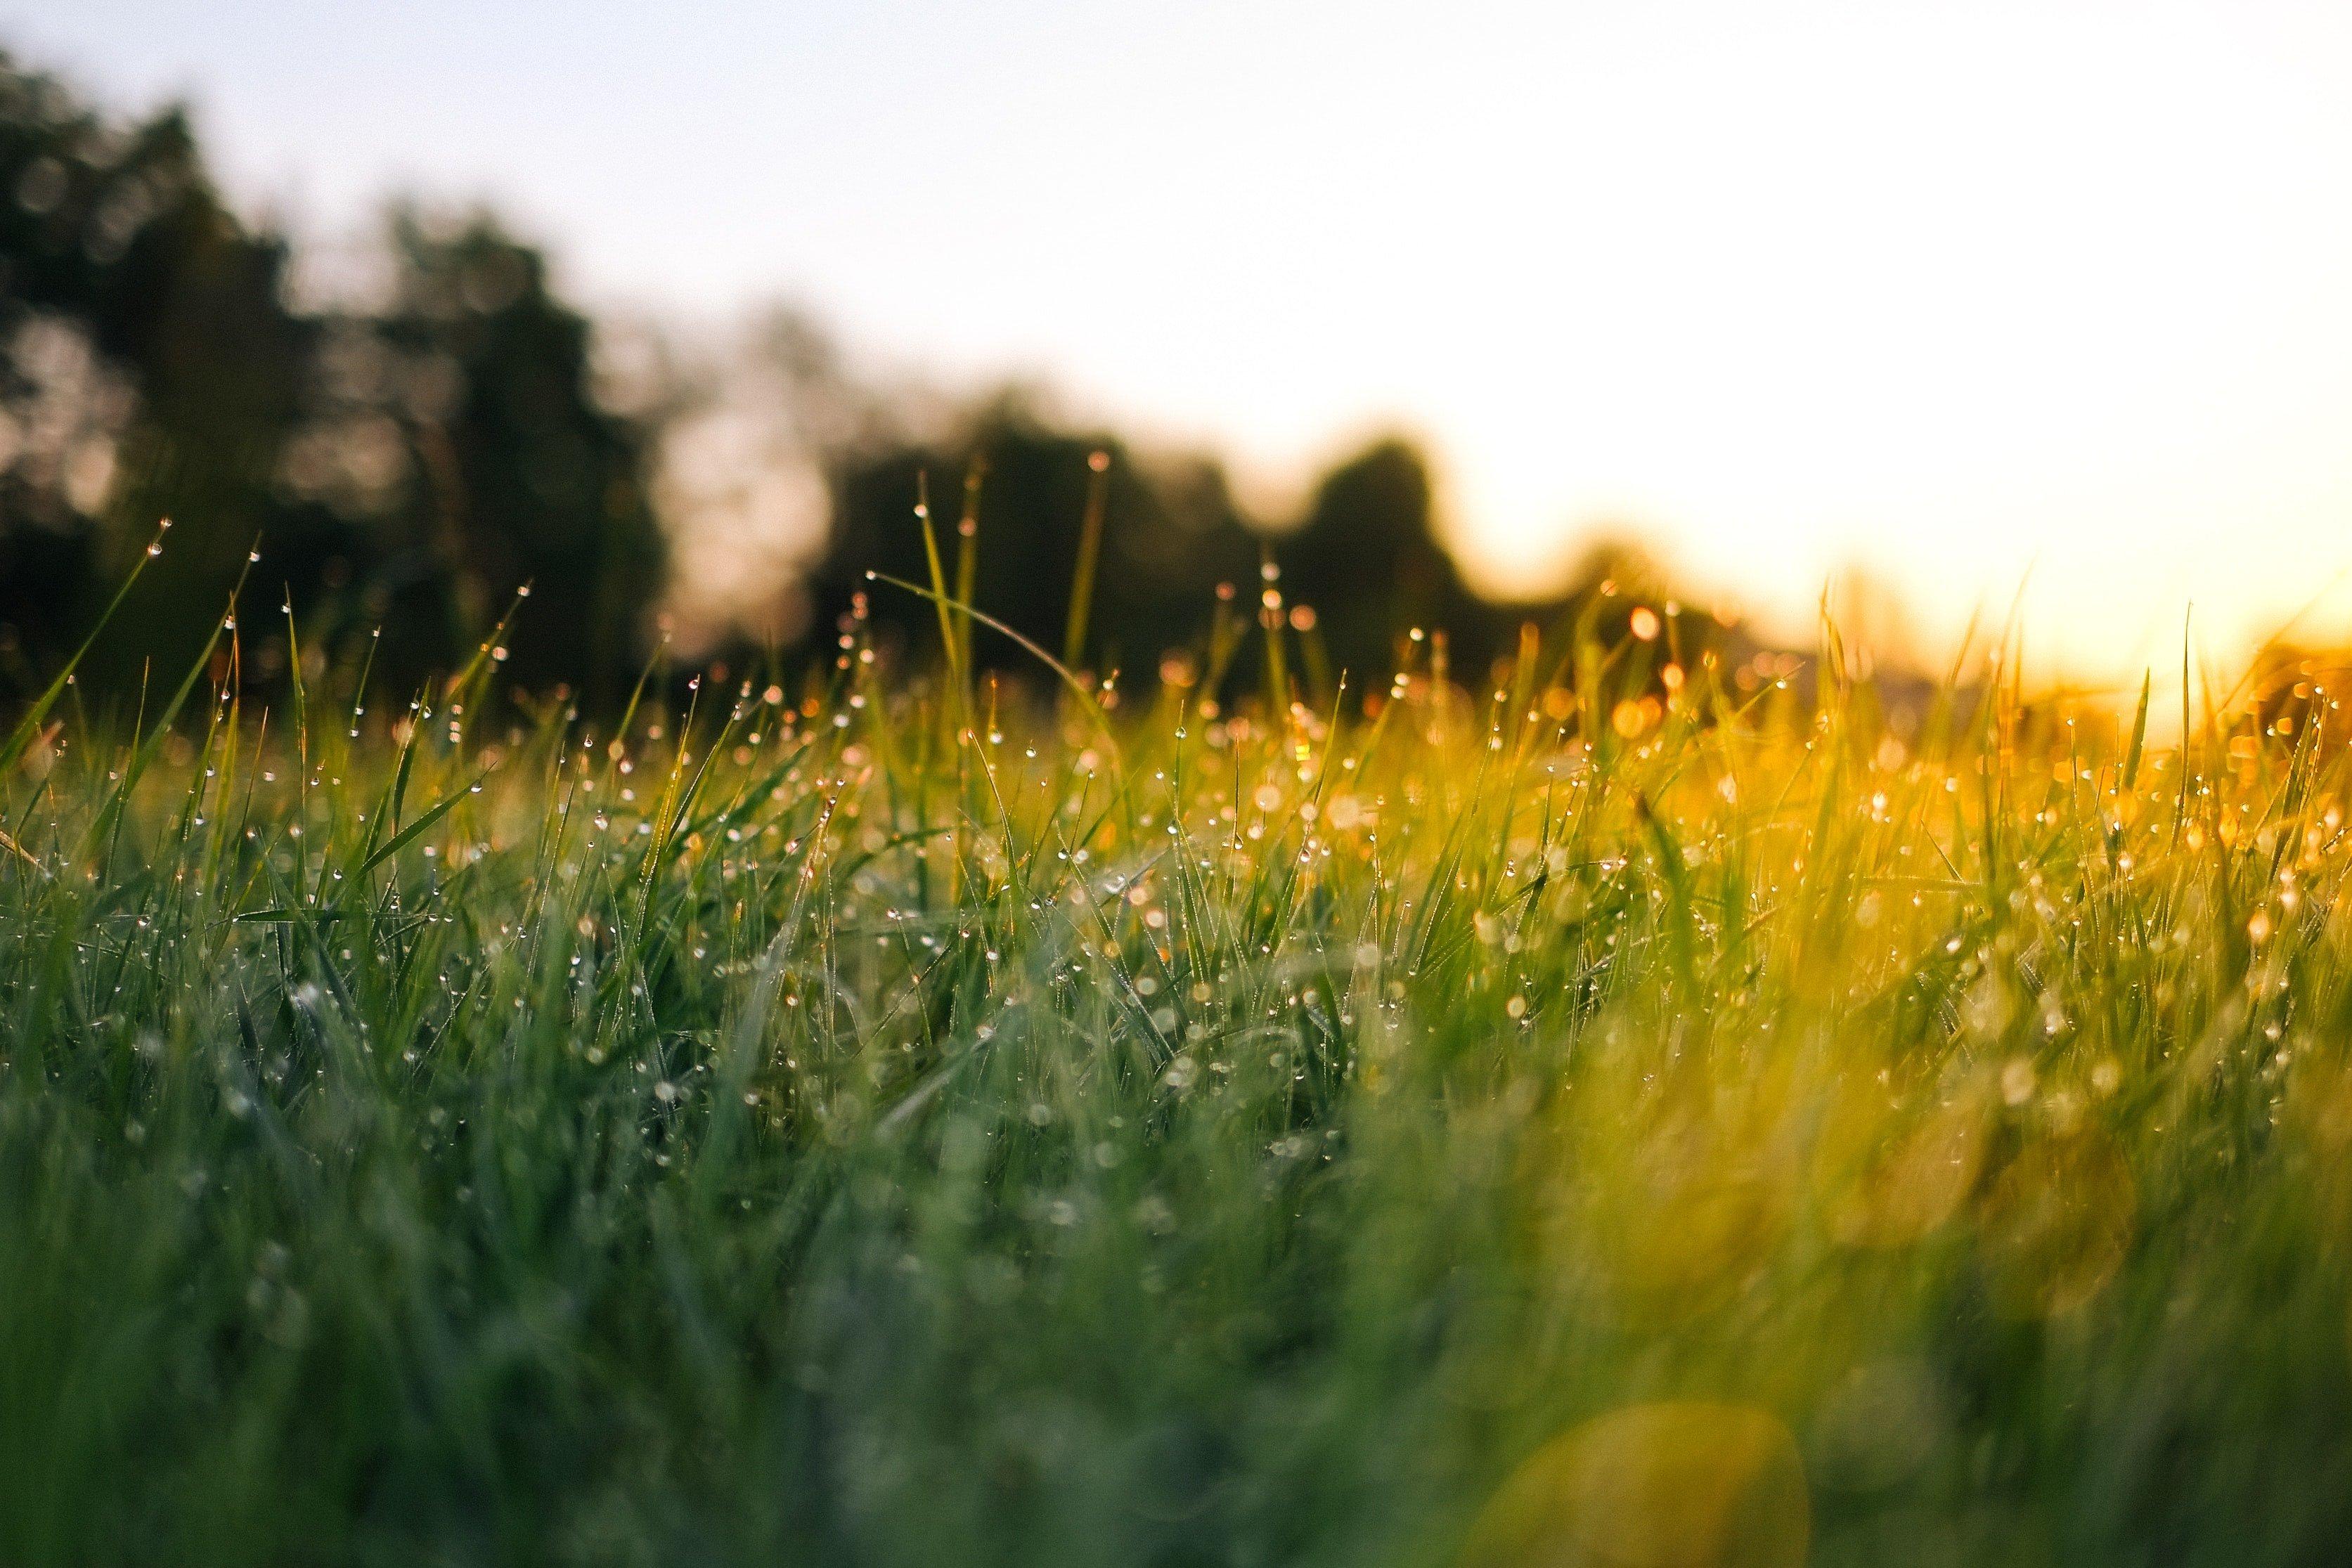 Grass on farm